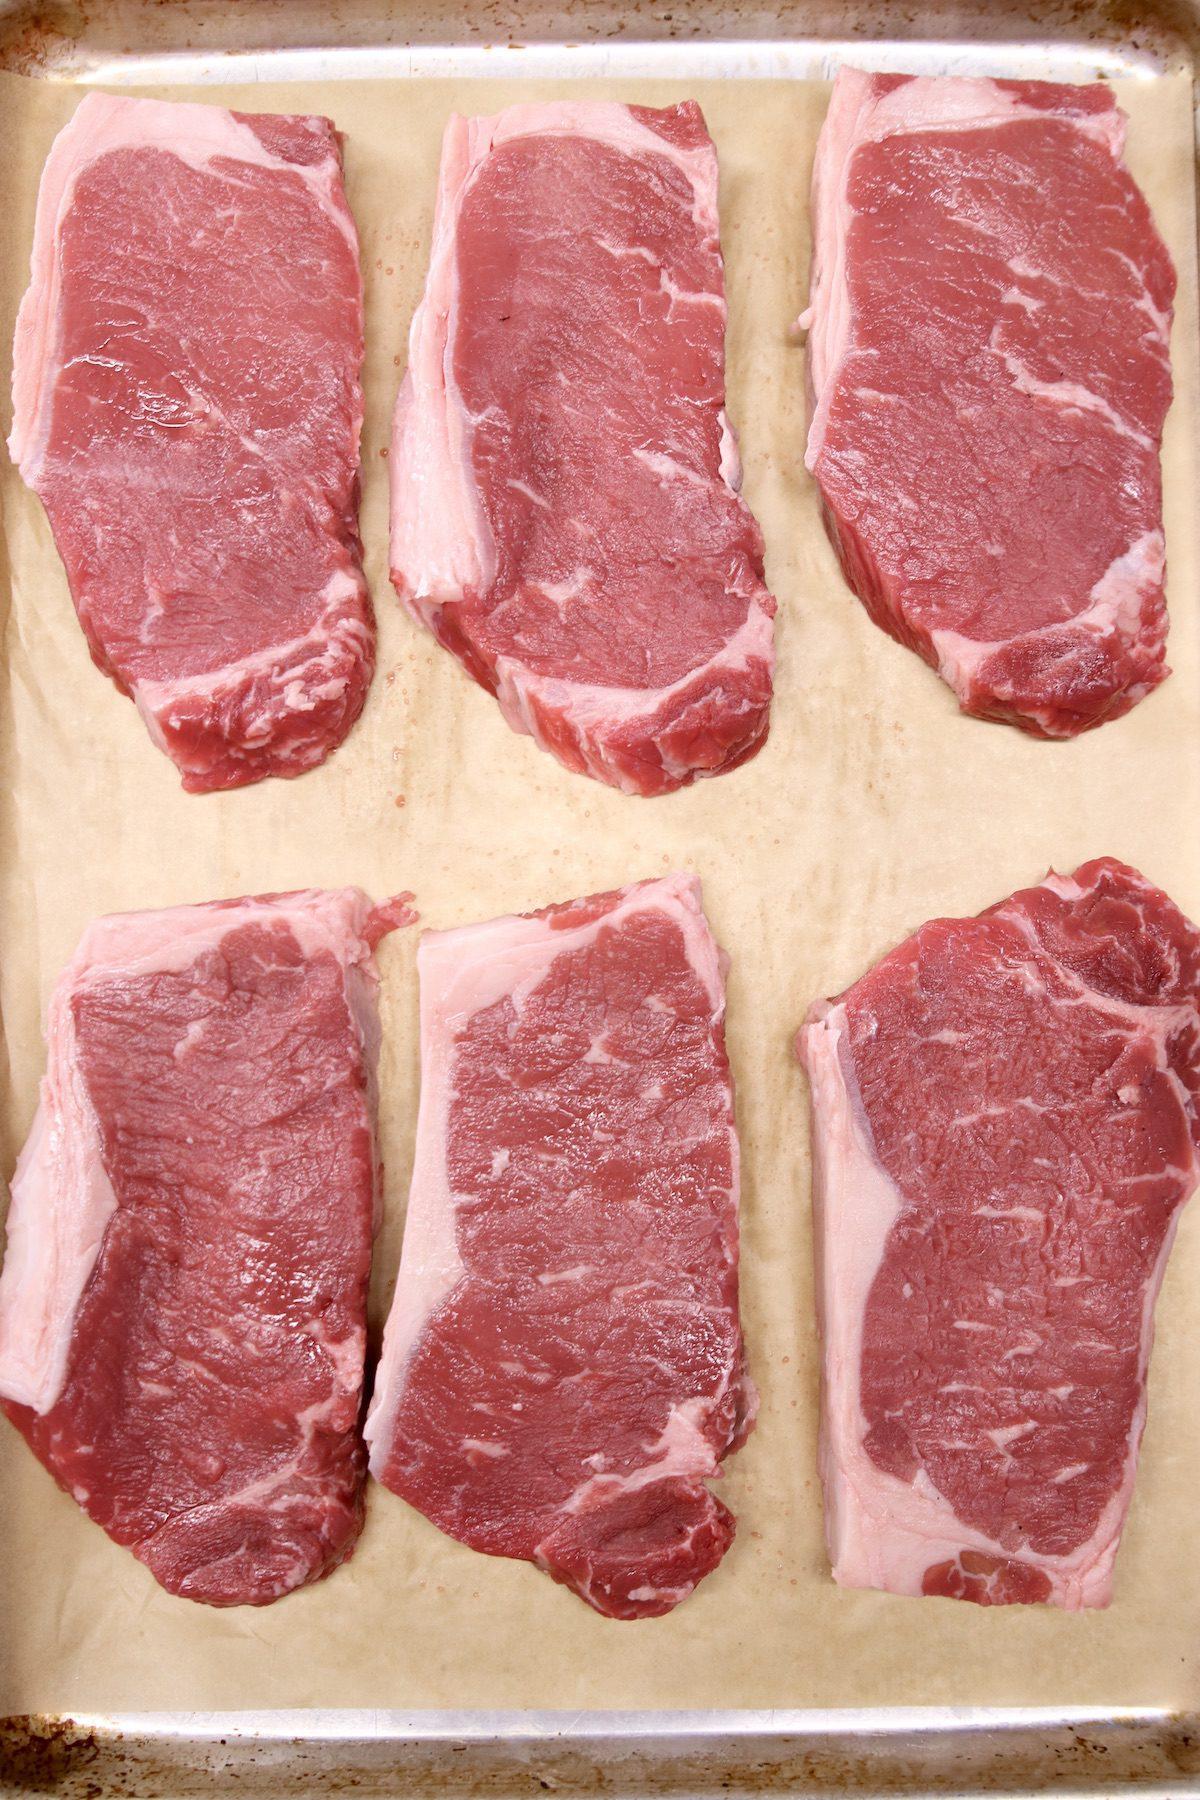 6 strip steaks on a sheet pan - raw